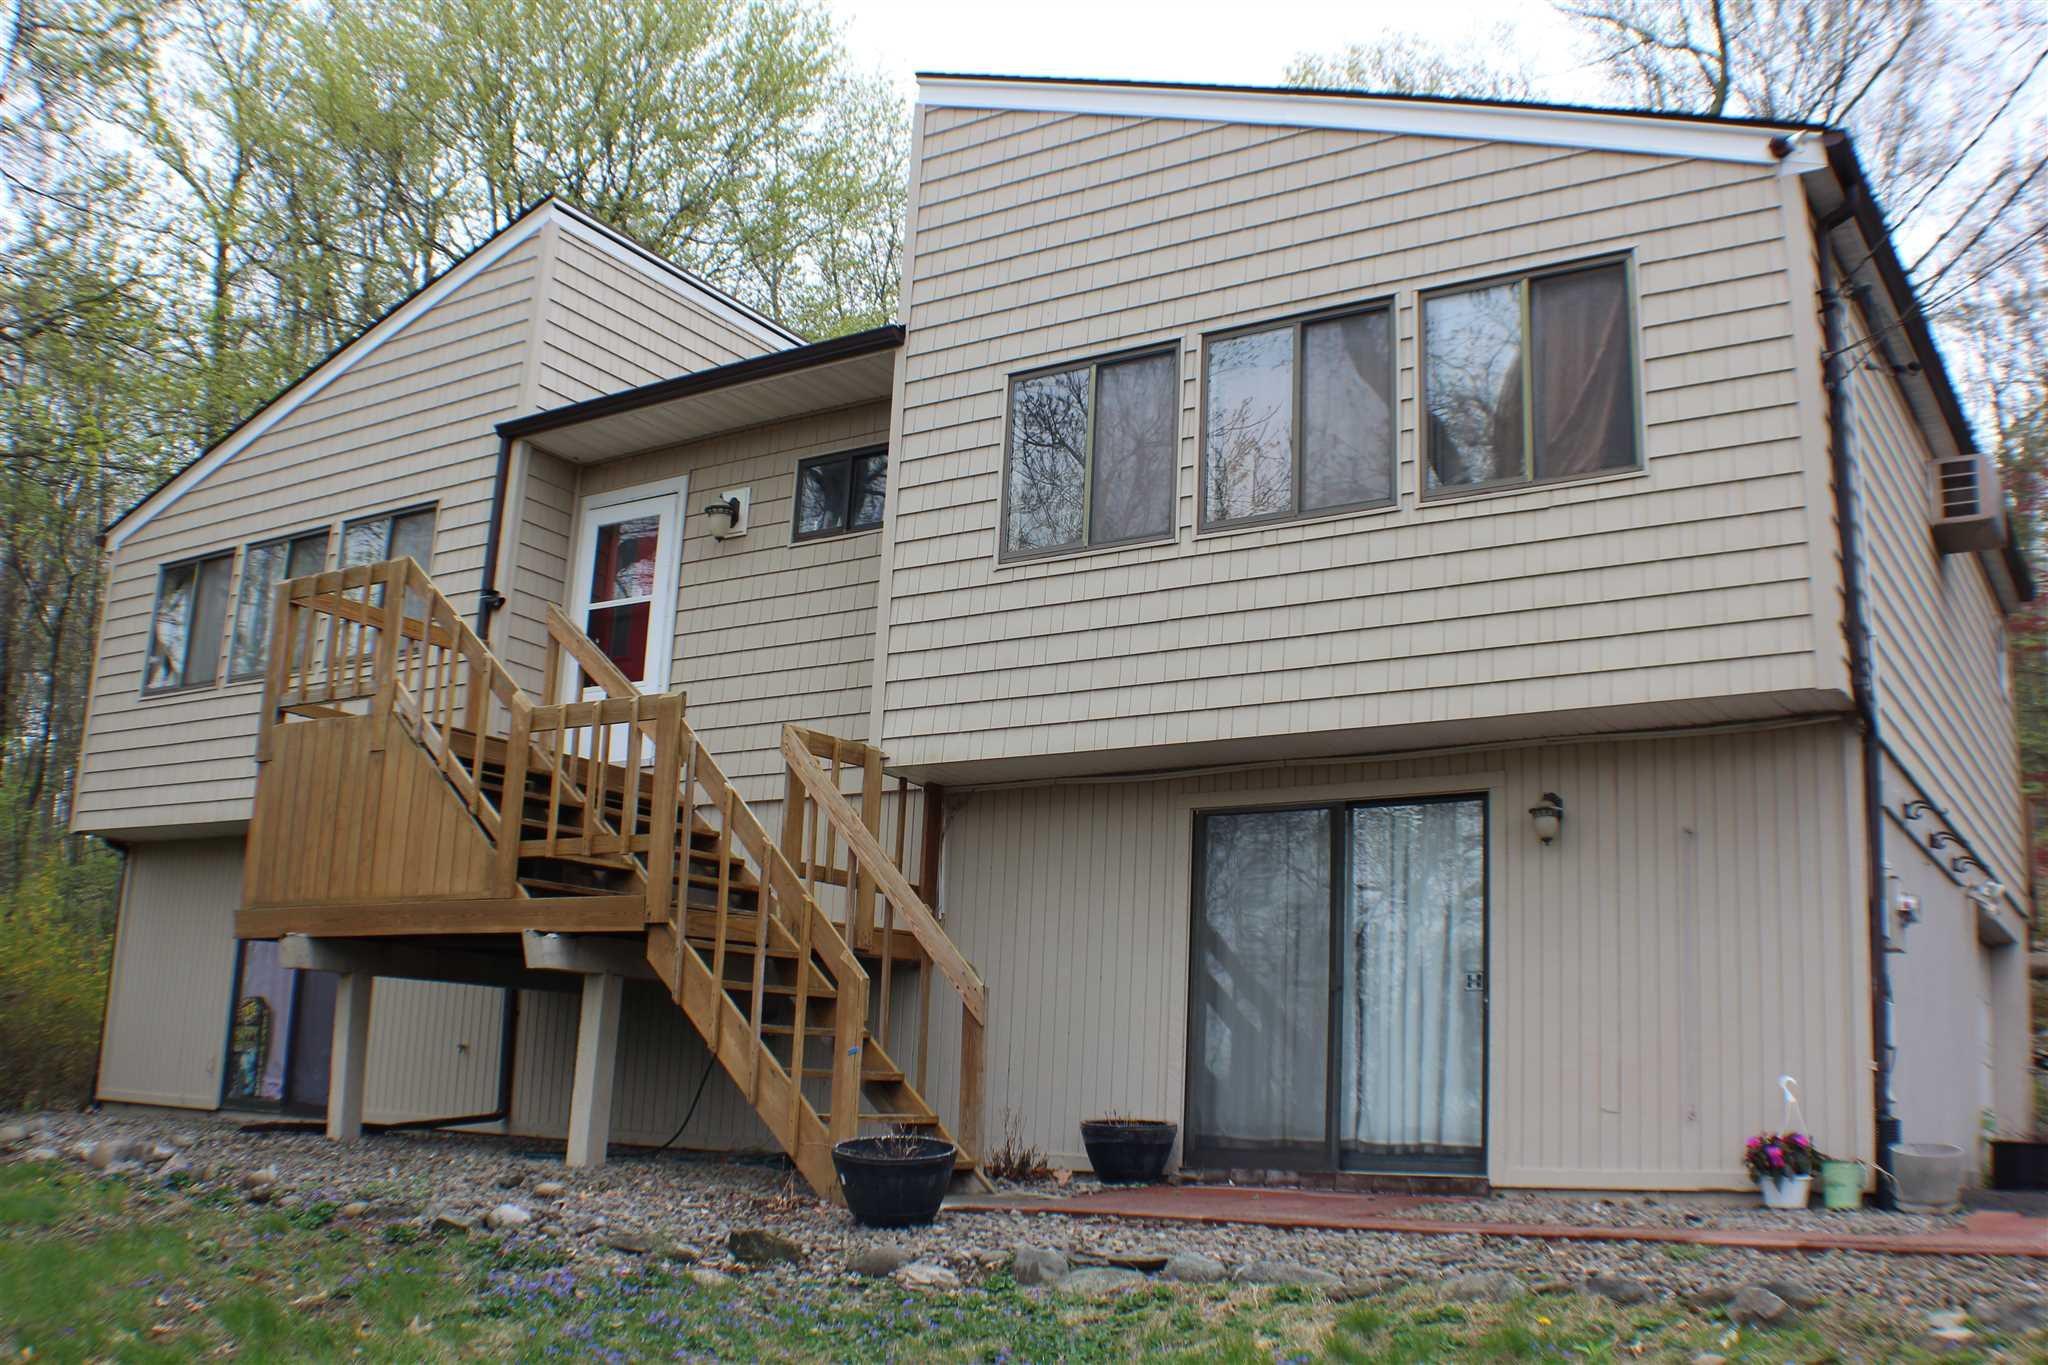 Single Family Home for Sale at 7 RIDGE Road 7 RIDGE Road East Fishkill, New York 12533 United States